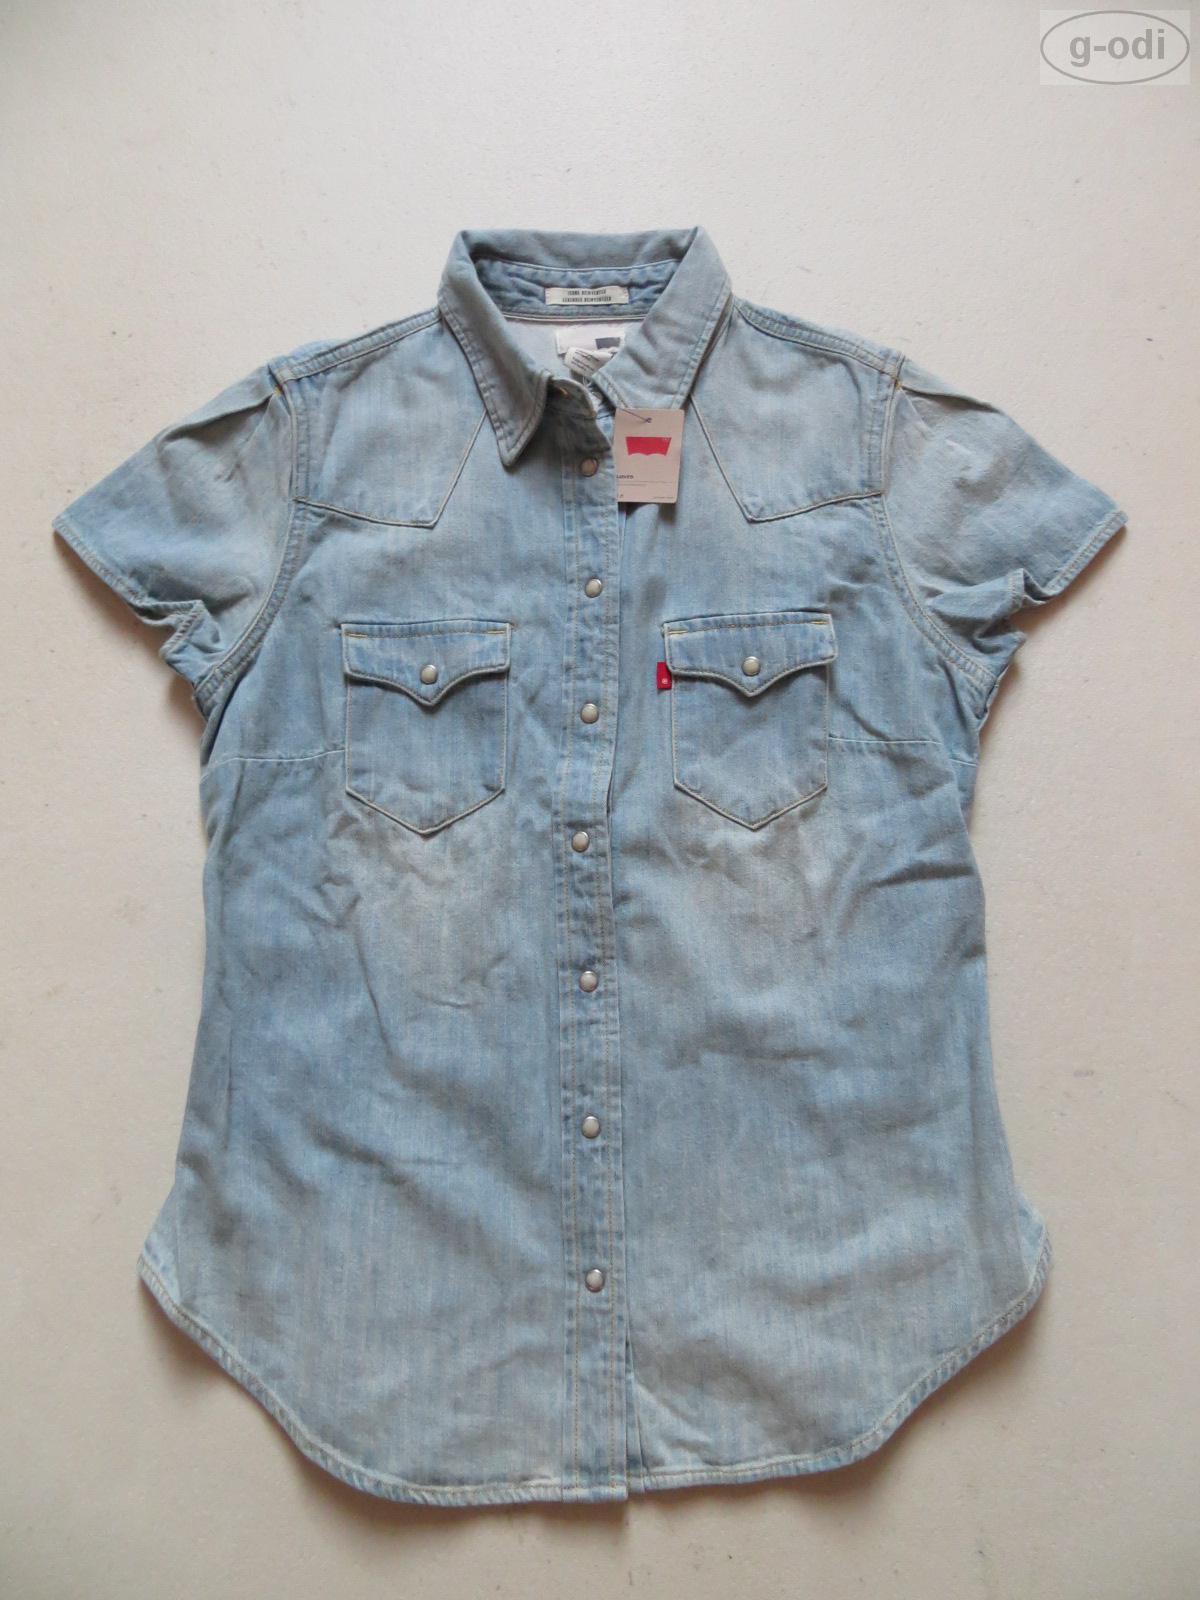 Levi 39 s bluse jeansbluse gr m neu kurzer arm feminin tailliert jeanshemd ebay - Jeanshemd damen lang ...